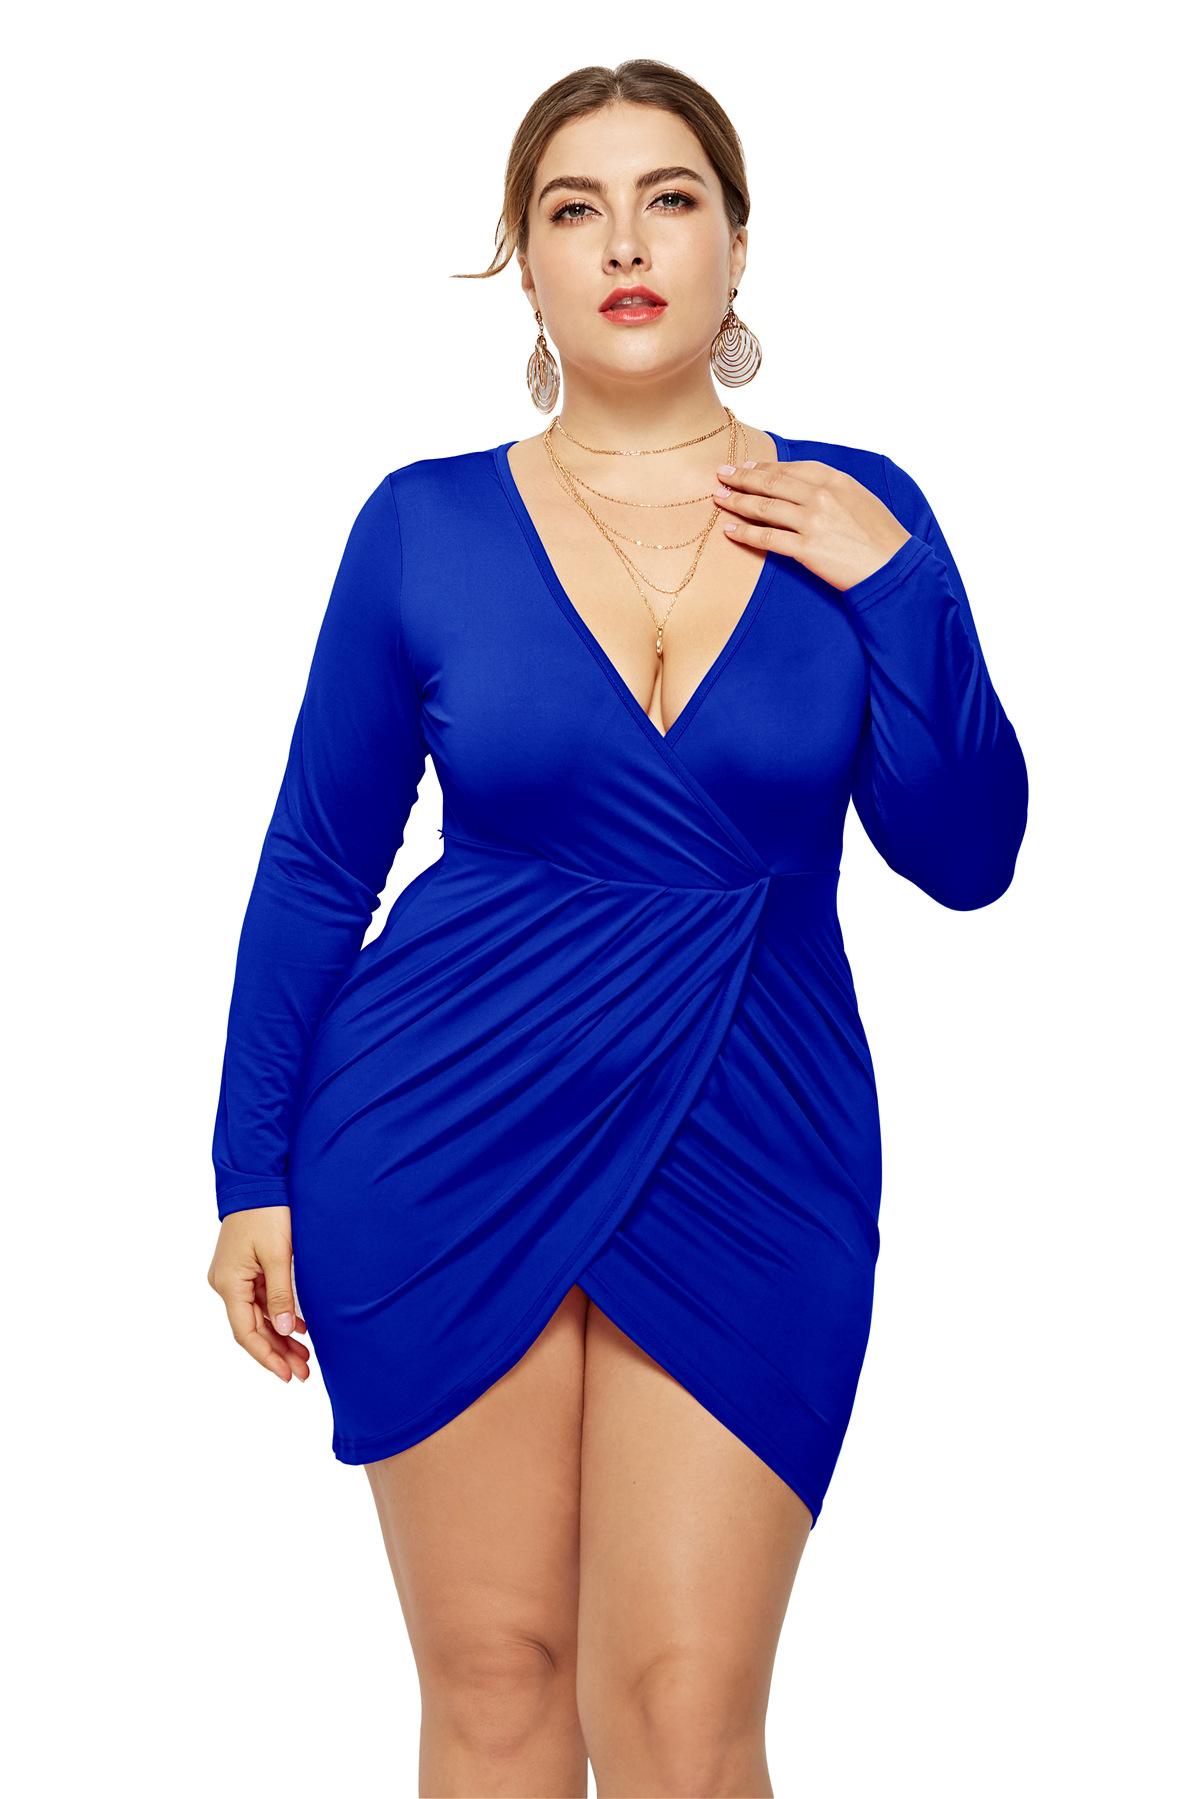 Sapphire Blue2.jpg